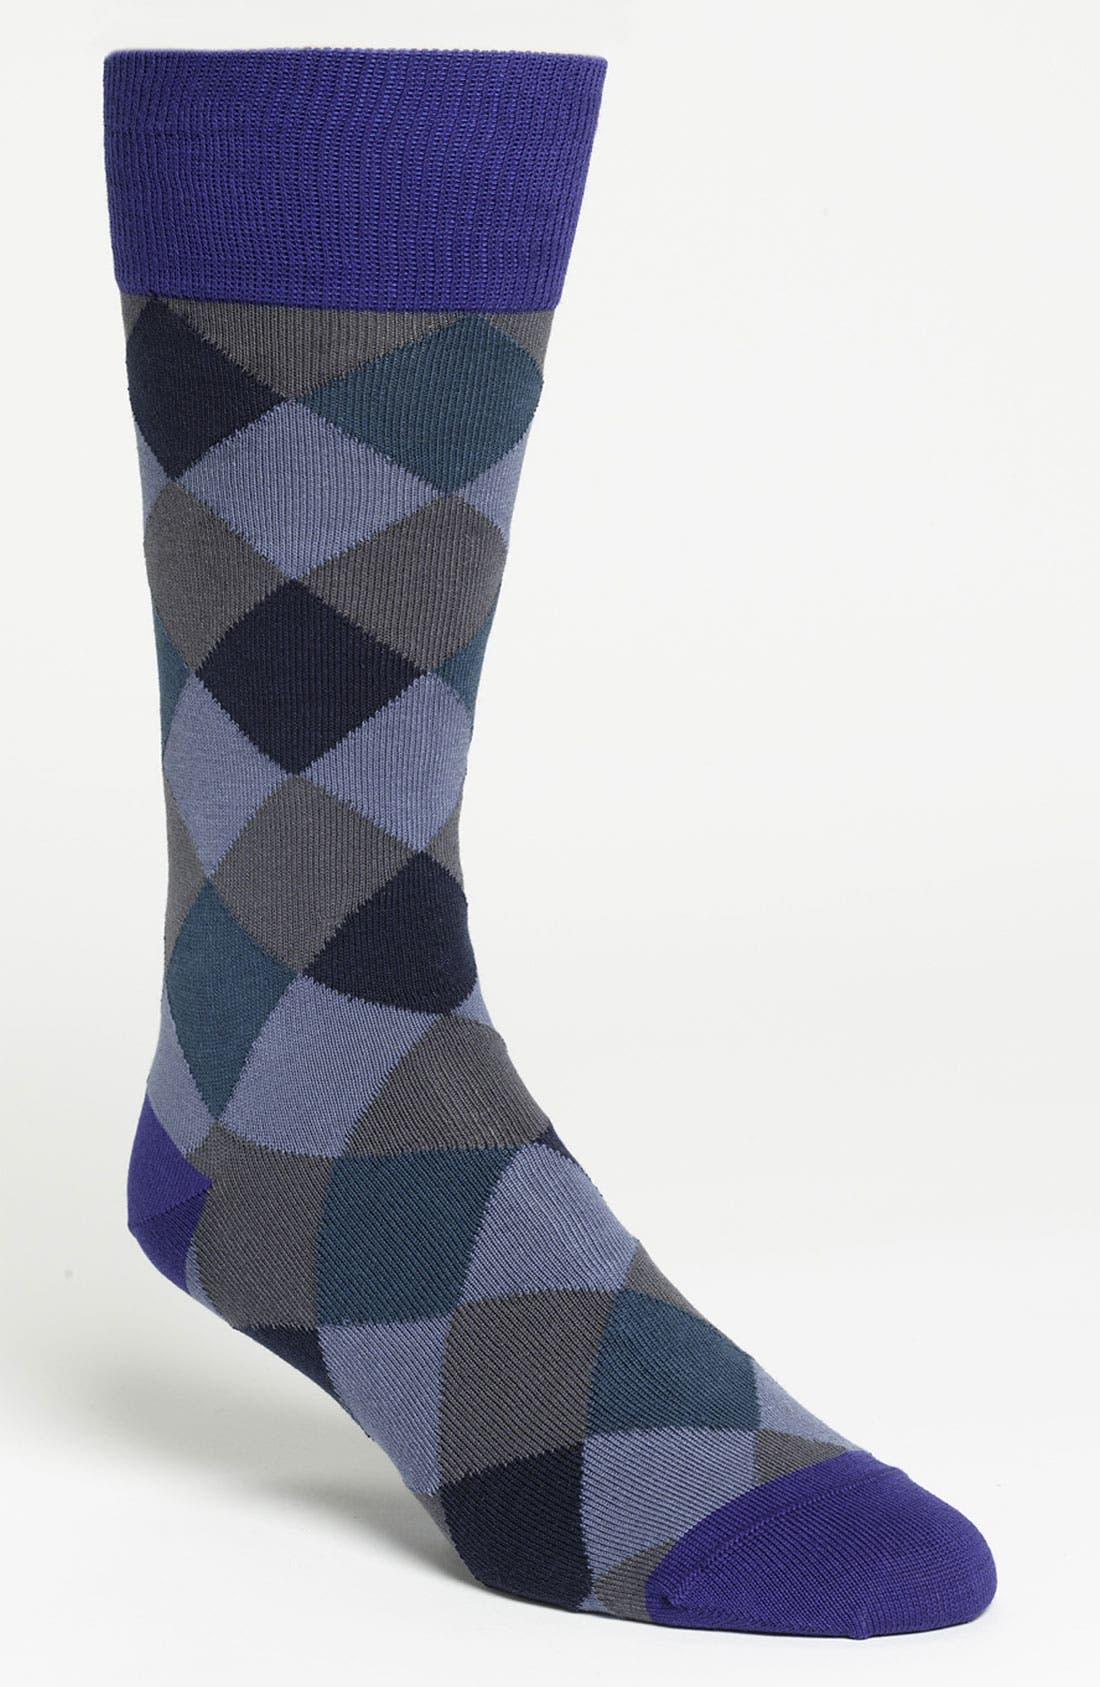 Main Image - Paul Smith Accessories Harlequin Diamond Socks